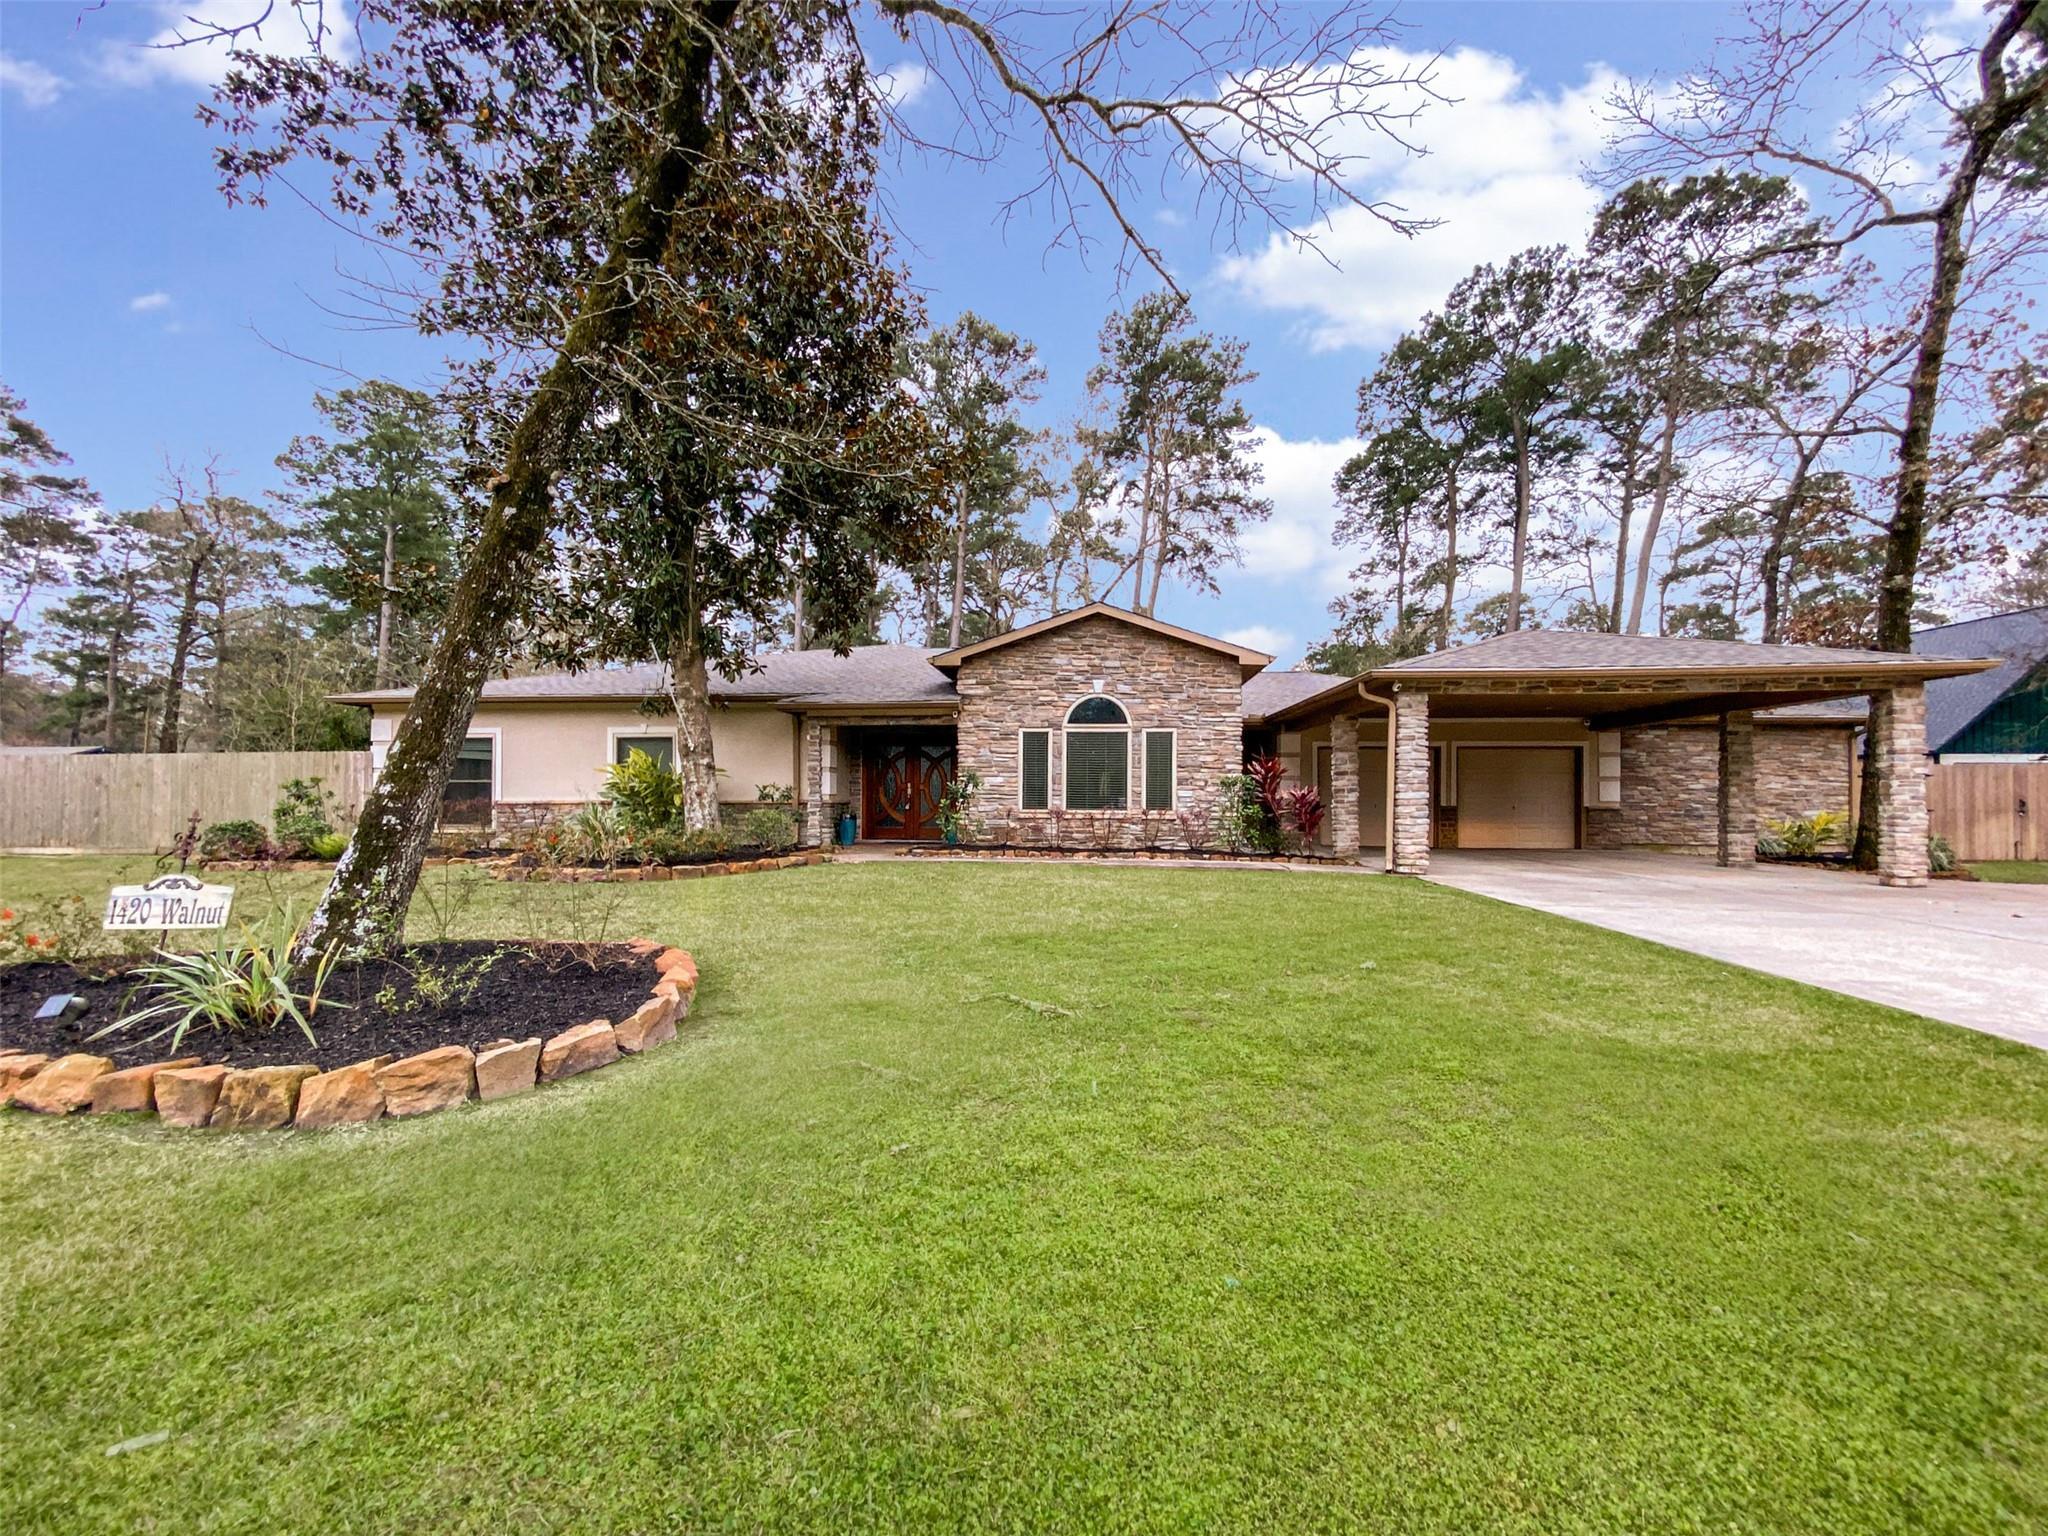 1420 Walnut Lane Property Photo - Kingwood, TX real estate listing